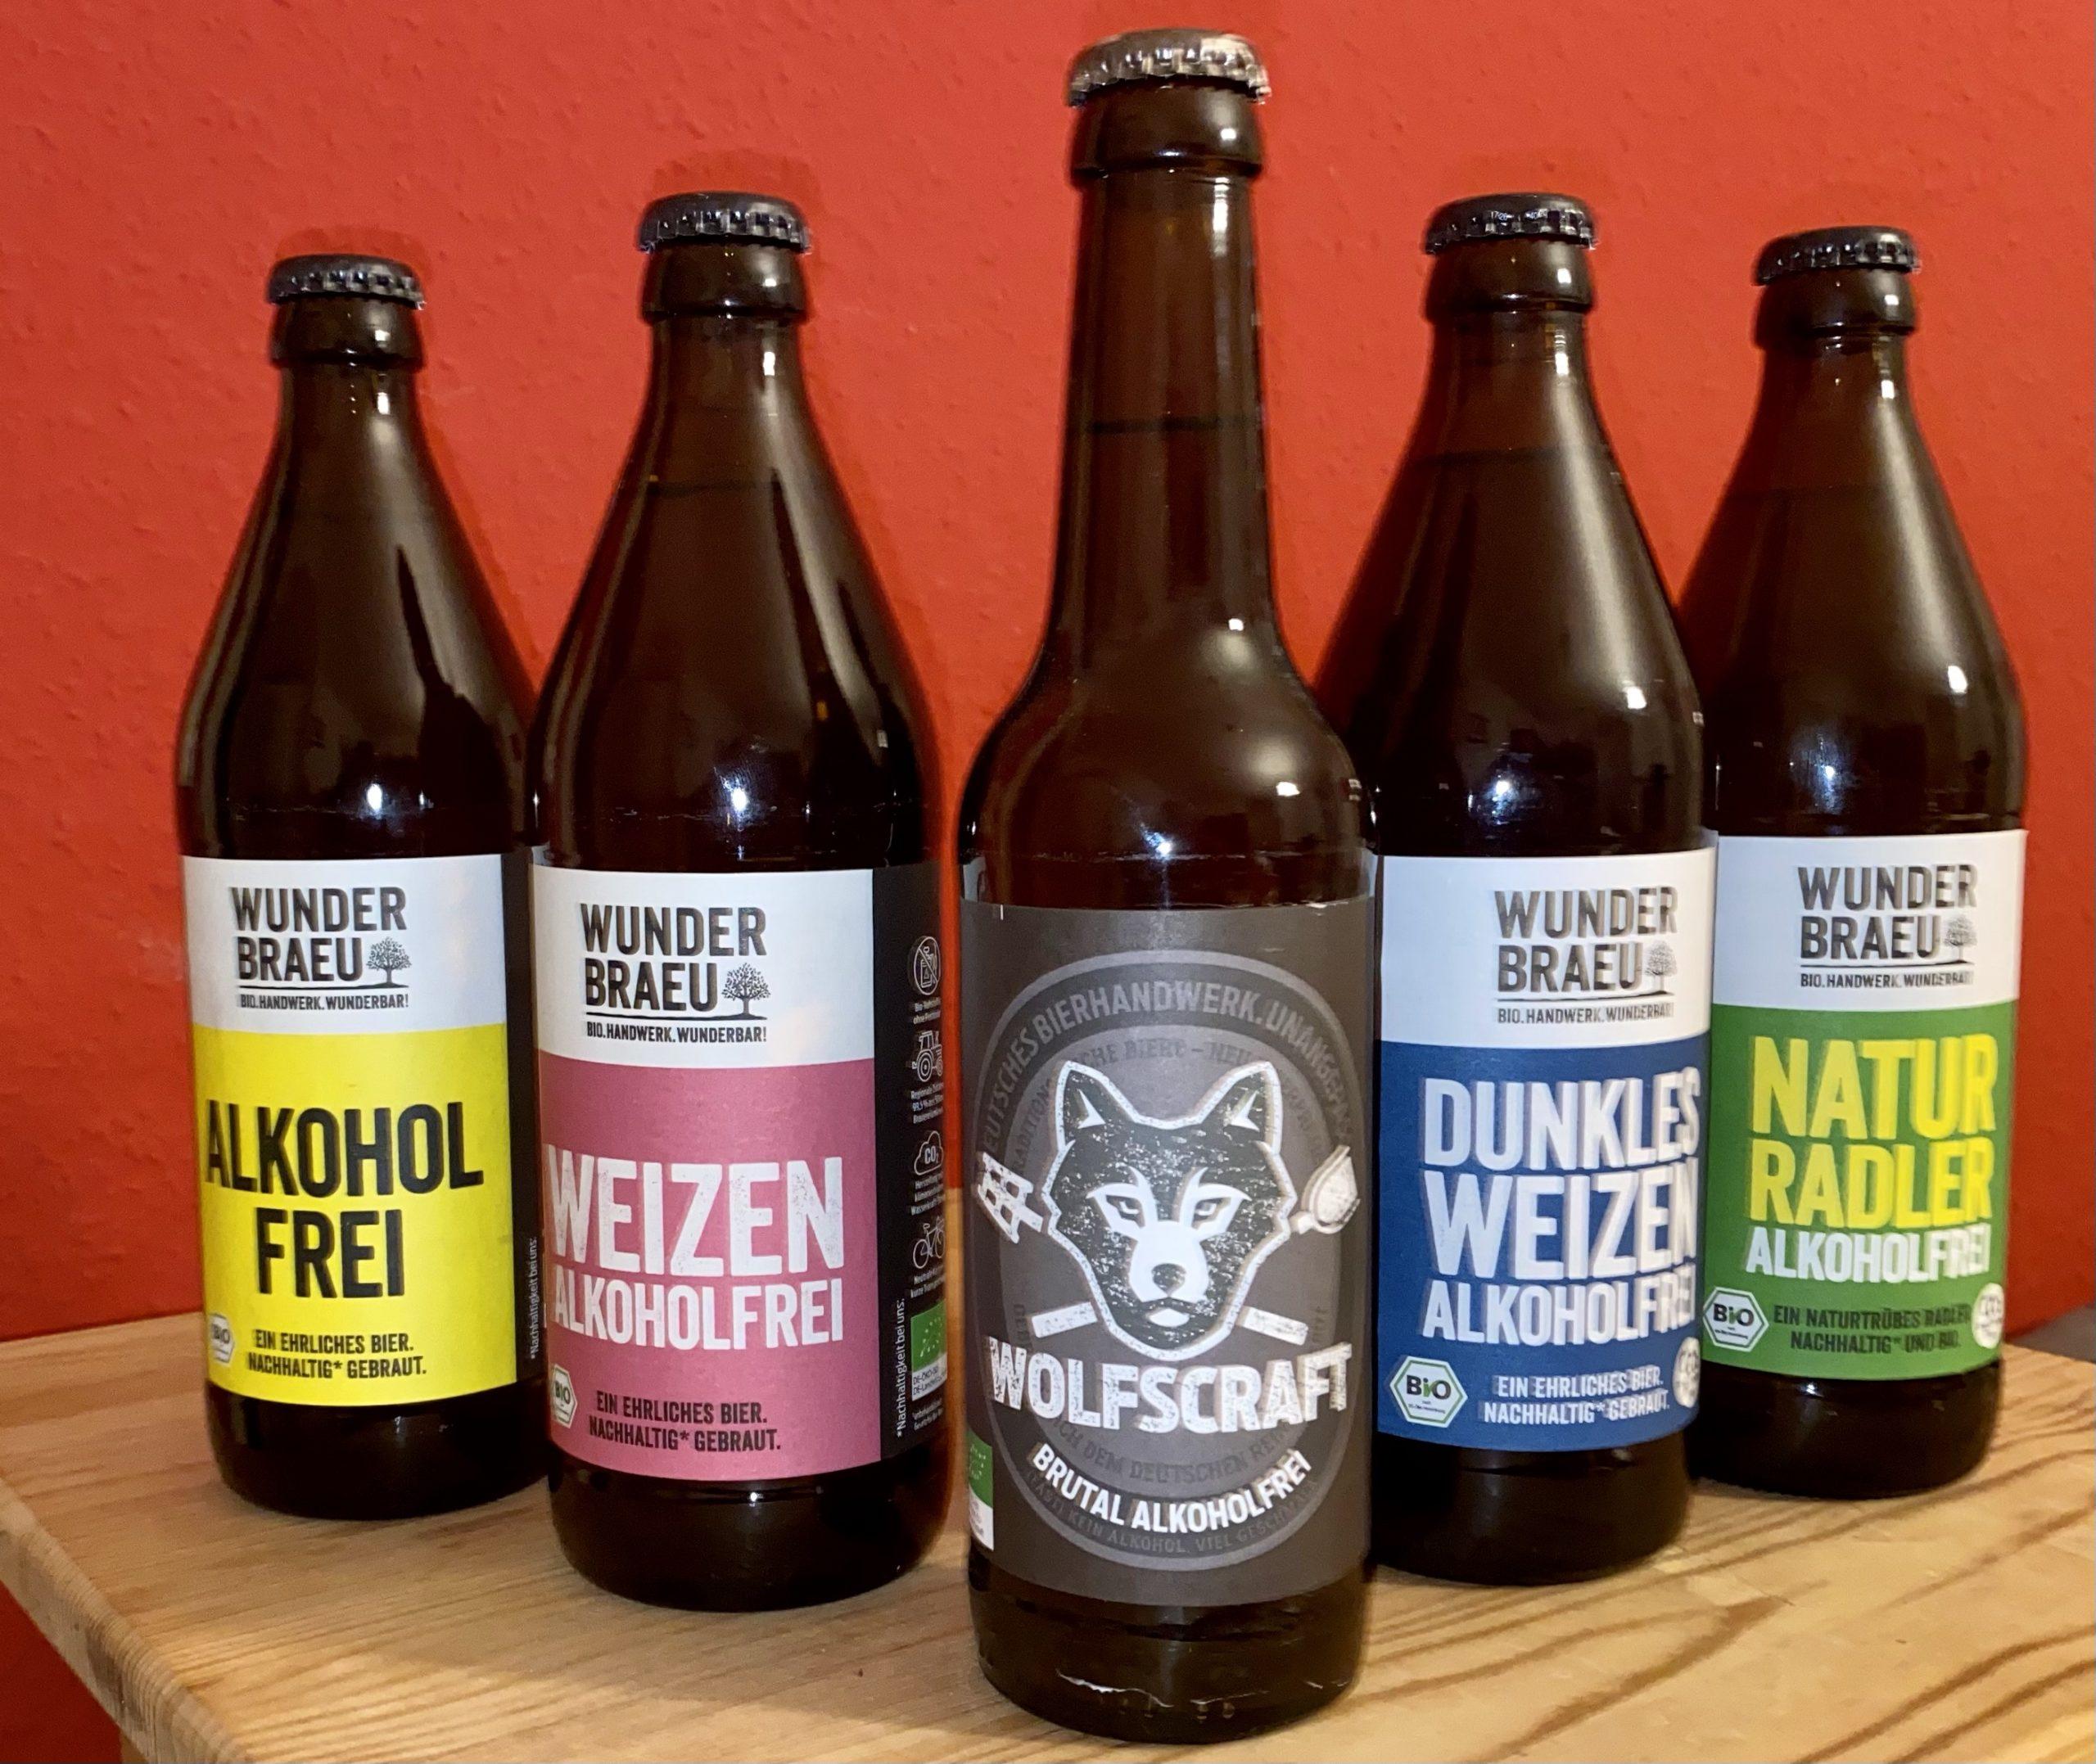 Wunderbräu Wunderbraeu Alkoholfre, Weizen, Naturradler Dunkles Weizen Bierprediger wolfscraft brutal